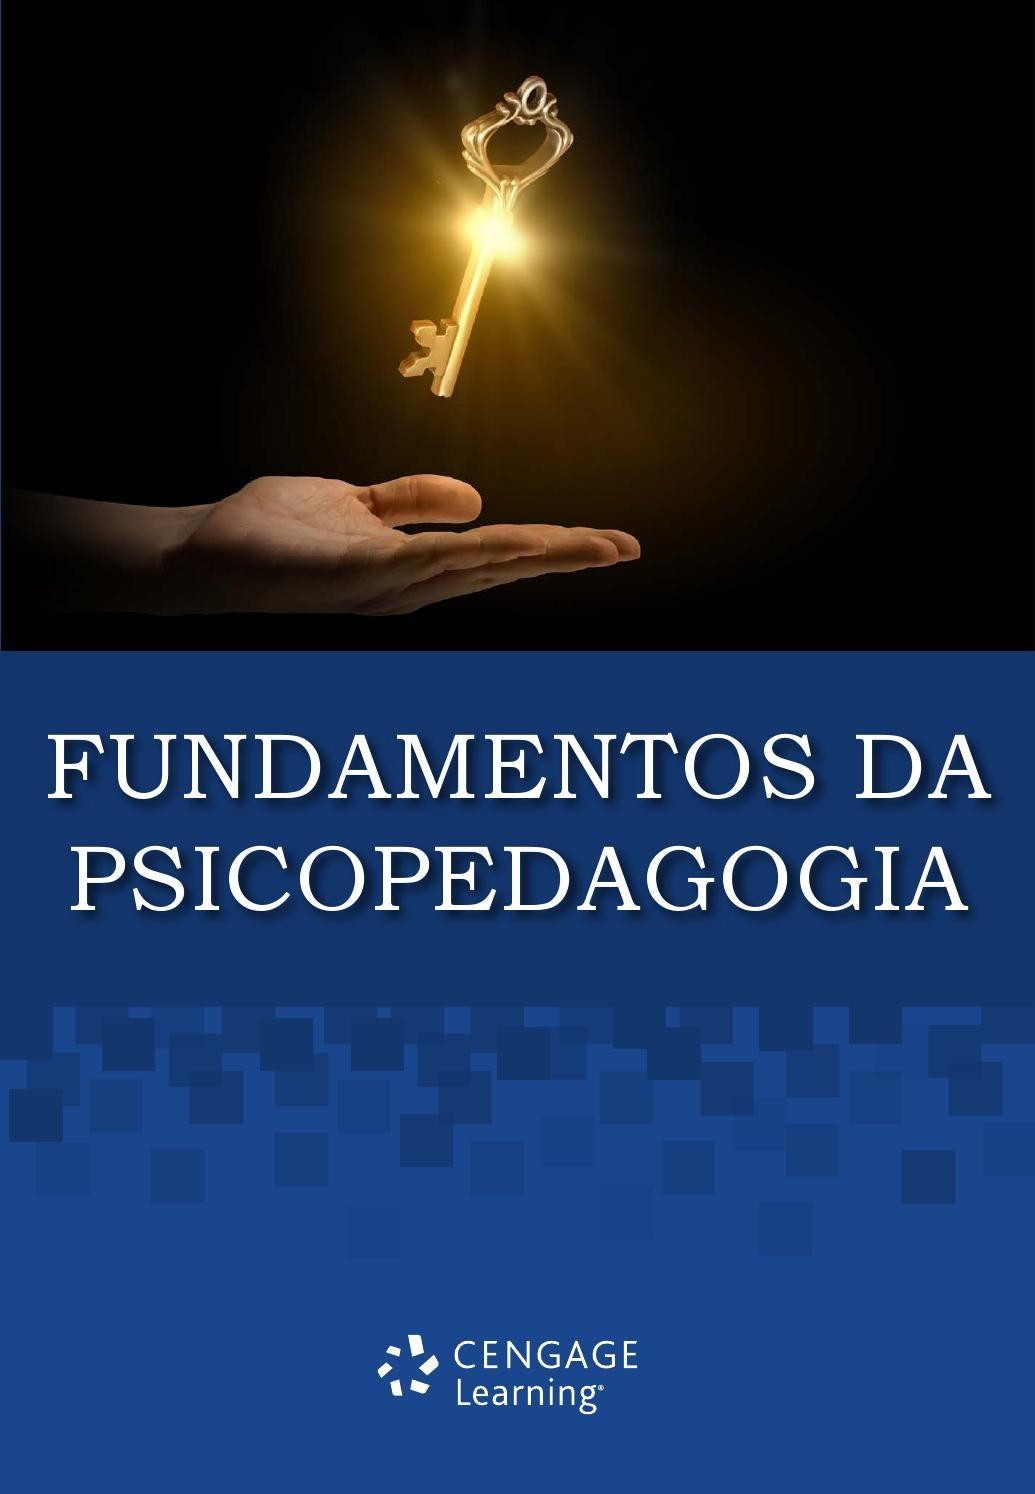 Fundamentos Da Psicopedagogia Psicopedagogia Psicologia Da